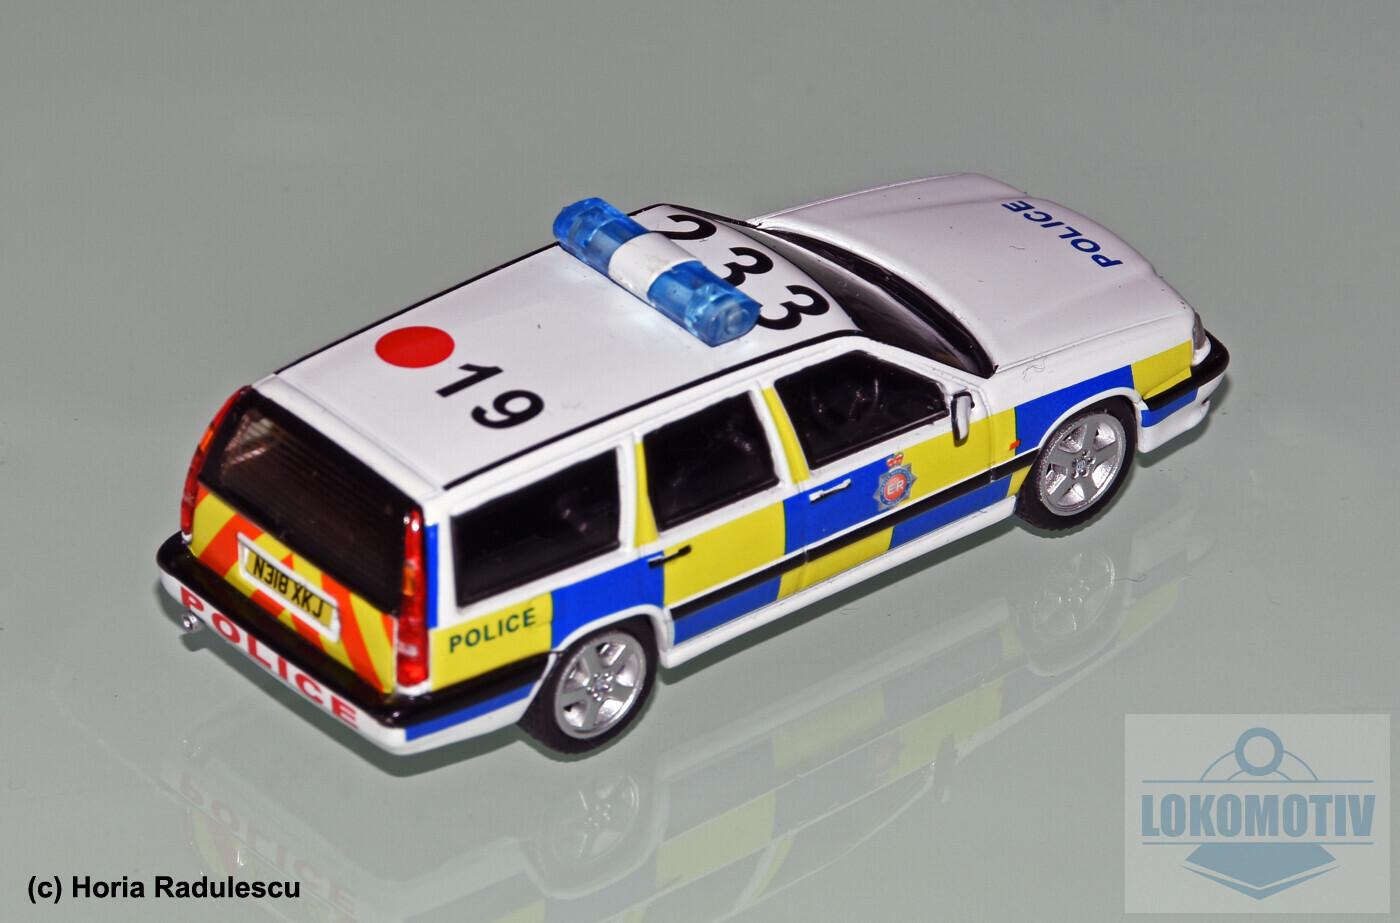 64-GB-Battenberg-Police-Volvo-850-Tarmac-Works-232c9f306224a4f32.jpg